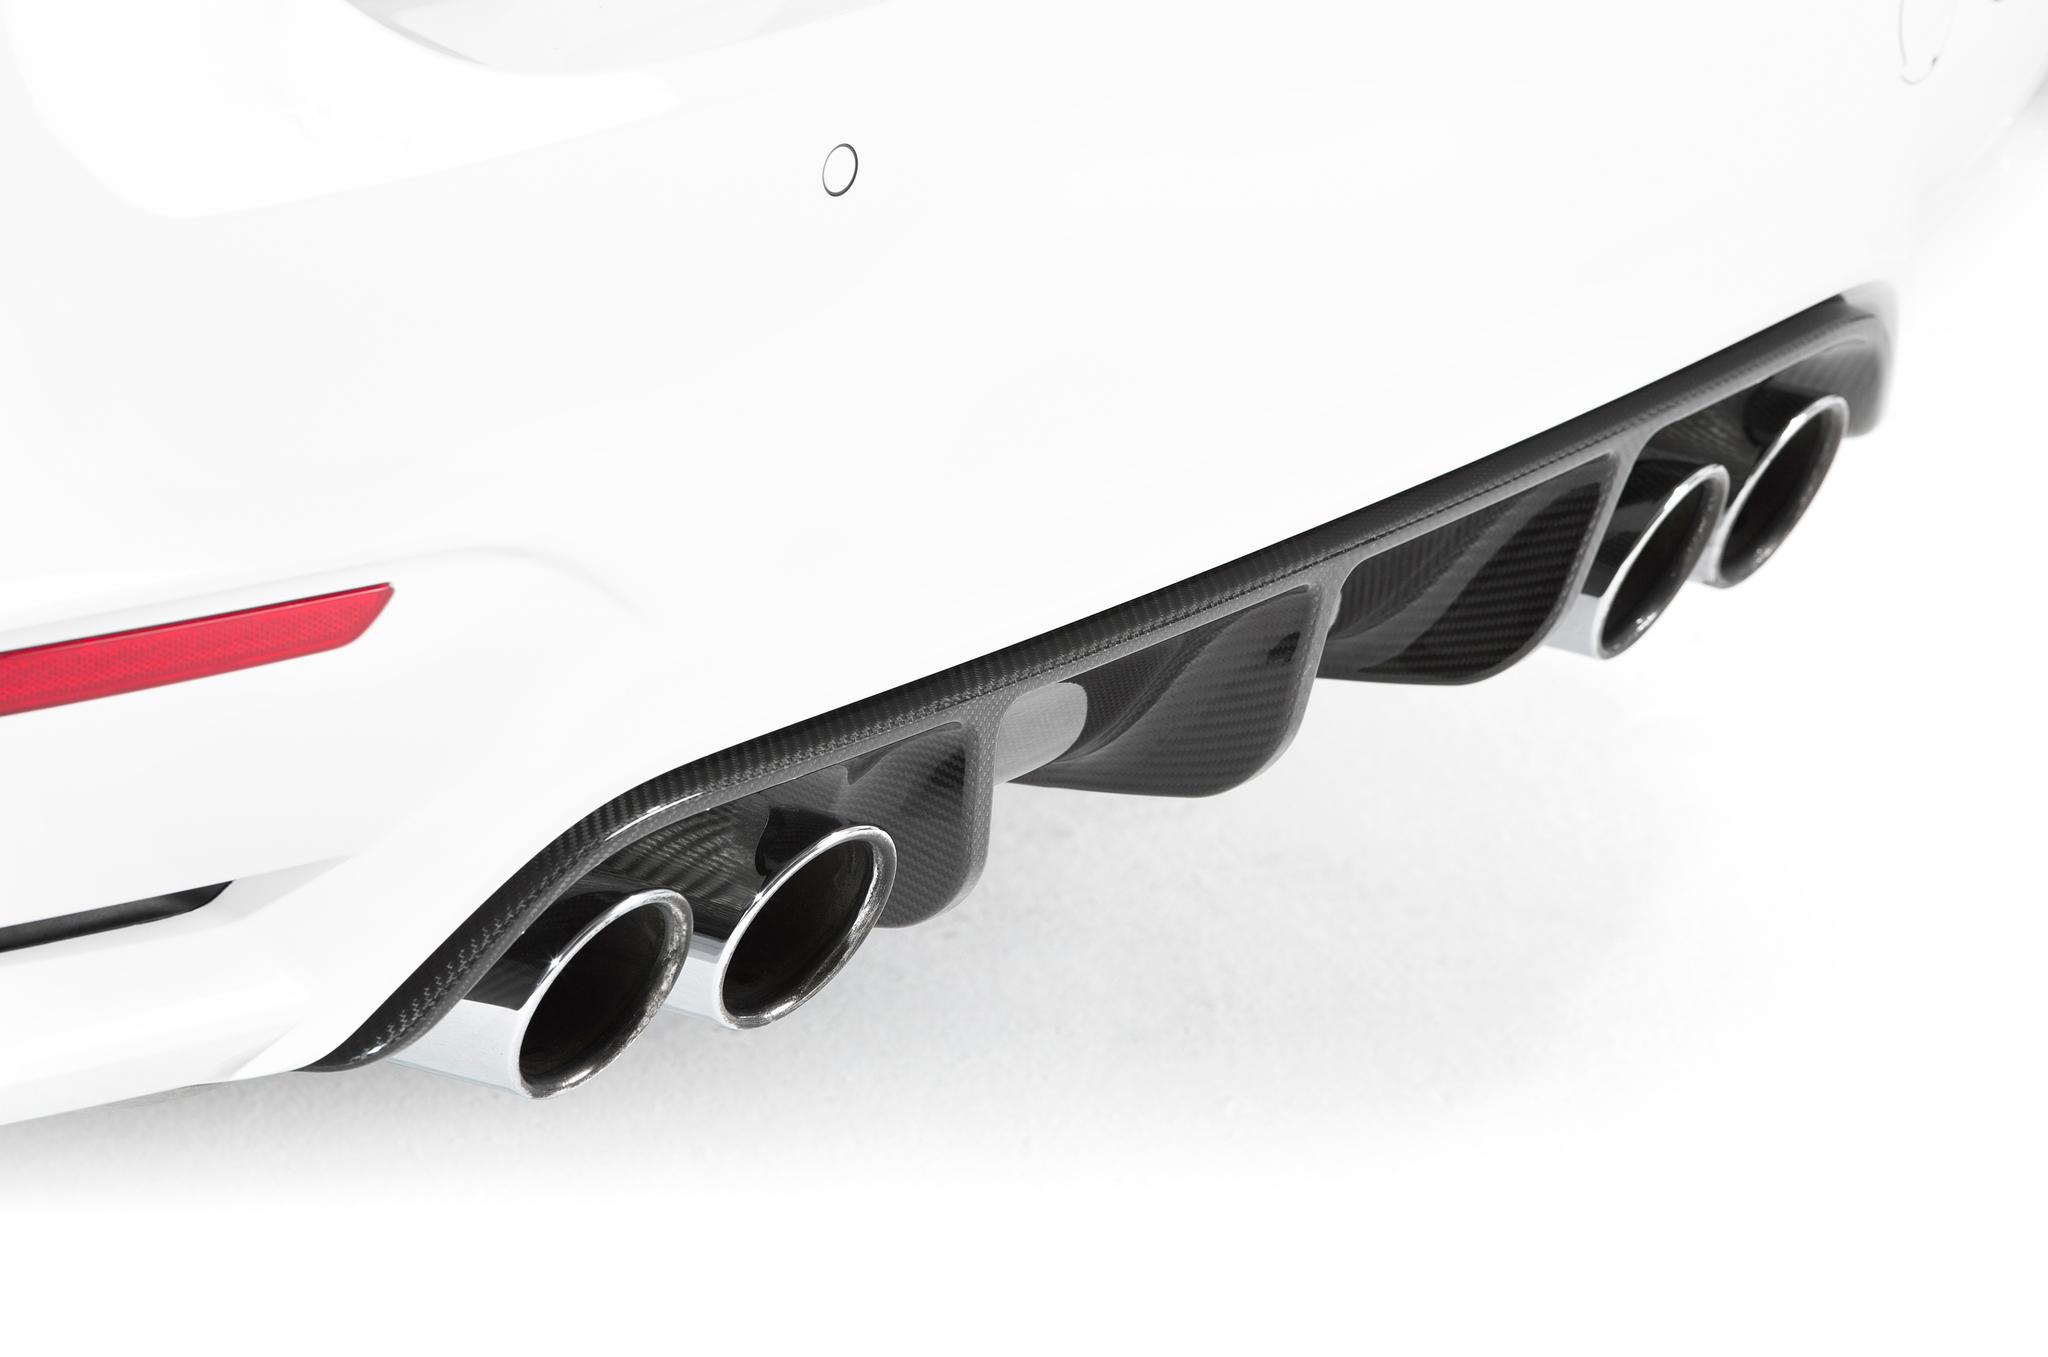 Sterckenn Carbon Fiber diffuser for BMW M4 F82 new style